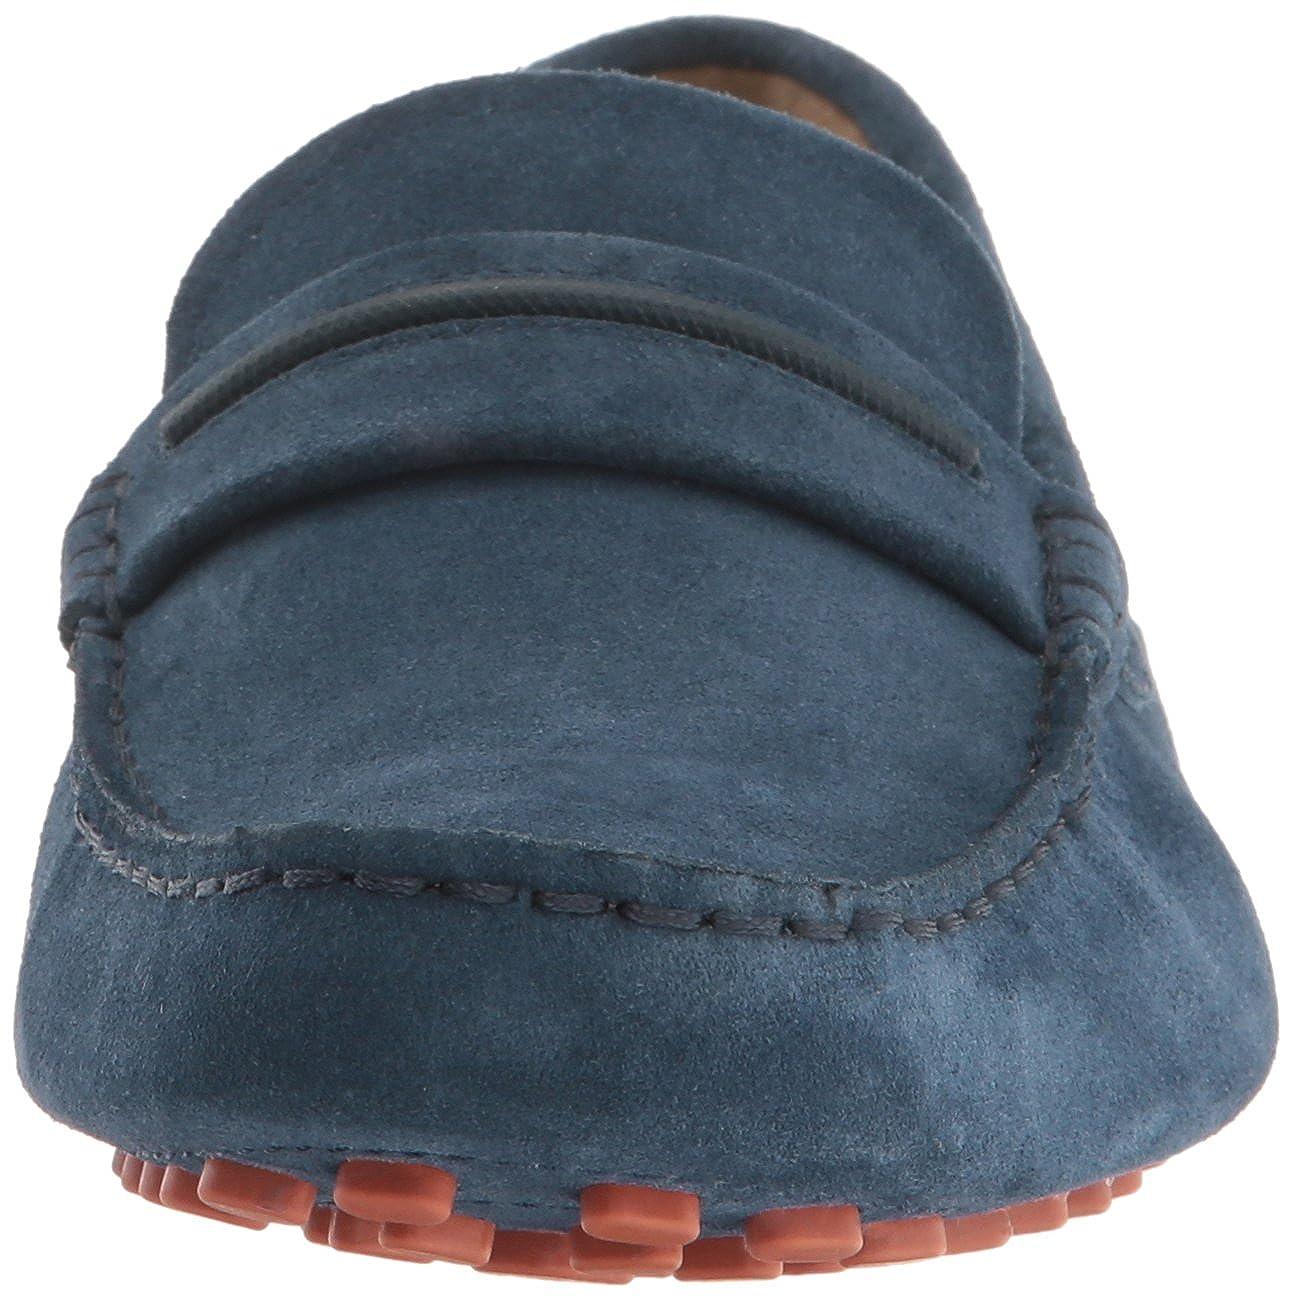 cf8ae6da69ec70 Lacoste Men s Herron 117 1 Formal Shoe Fashion Sneaker